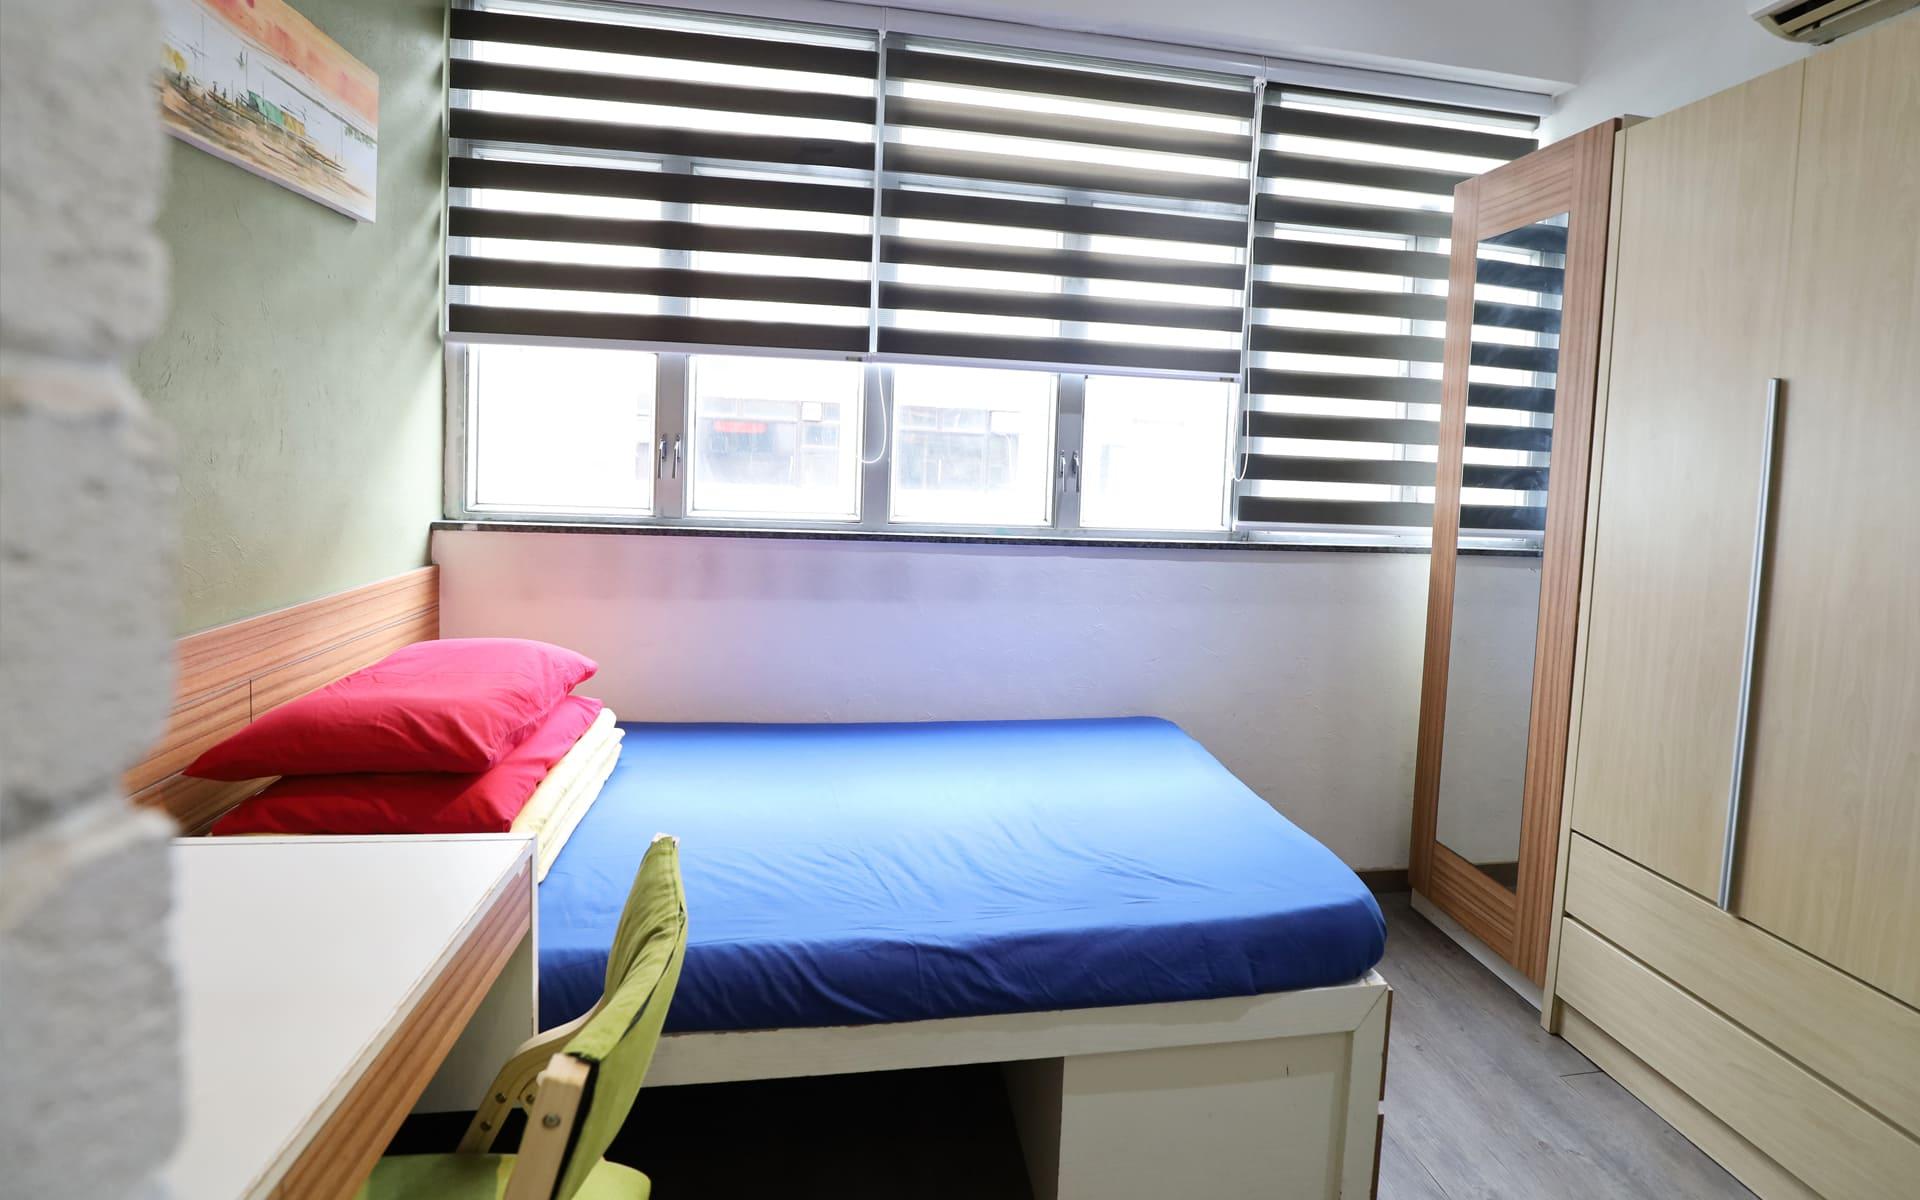 hk_service_apartment_9413097191596699328.jpg